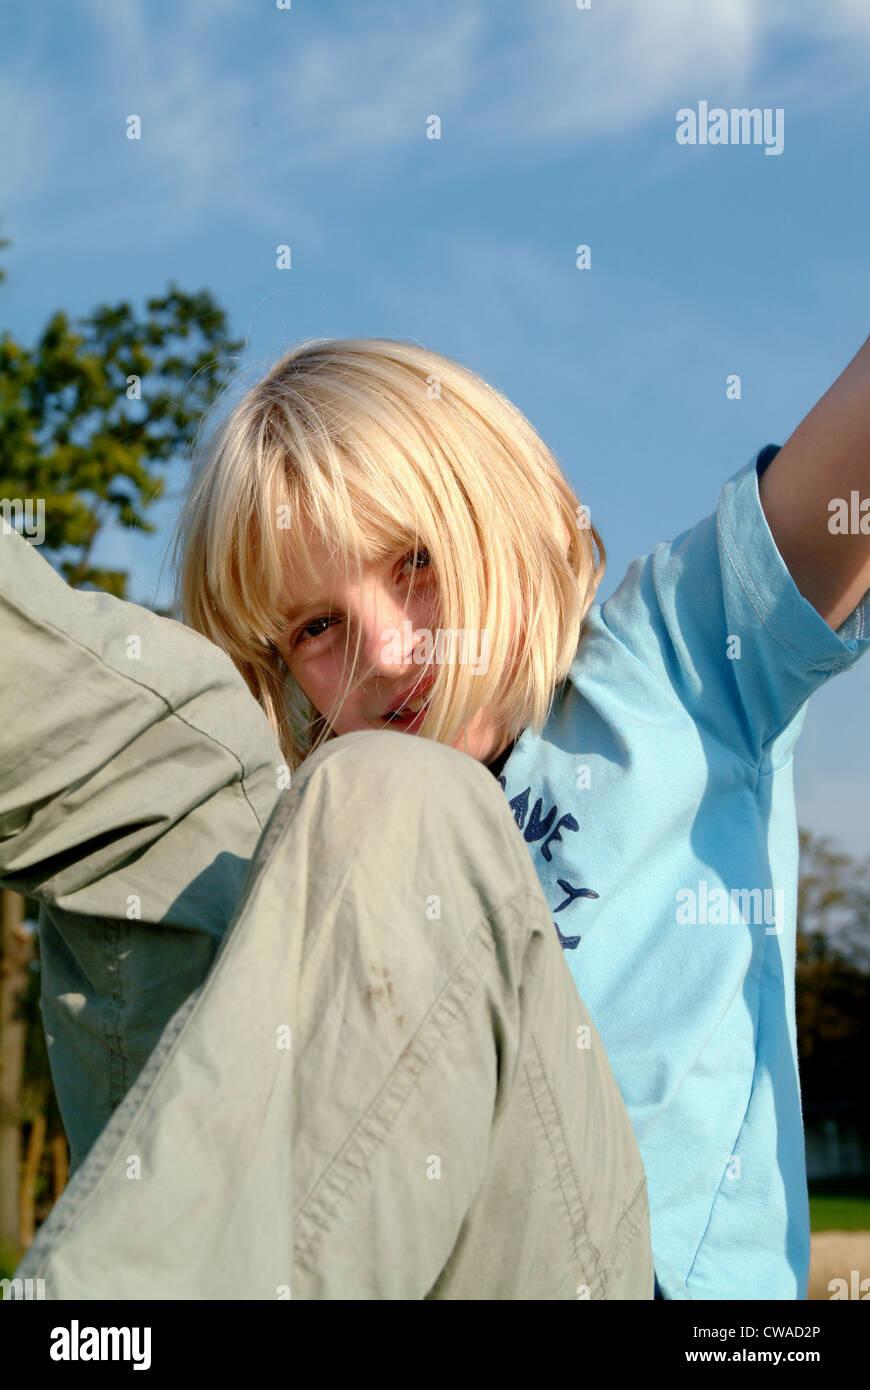 Lehnin girl when Rumtoben on Kuerbisfest Lehnin Stock Photo